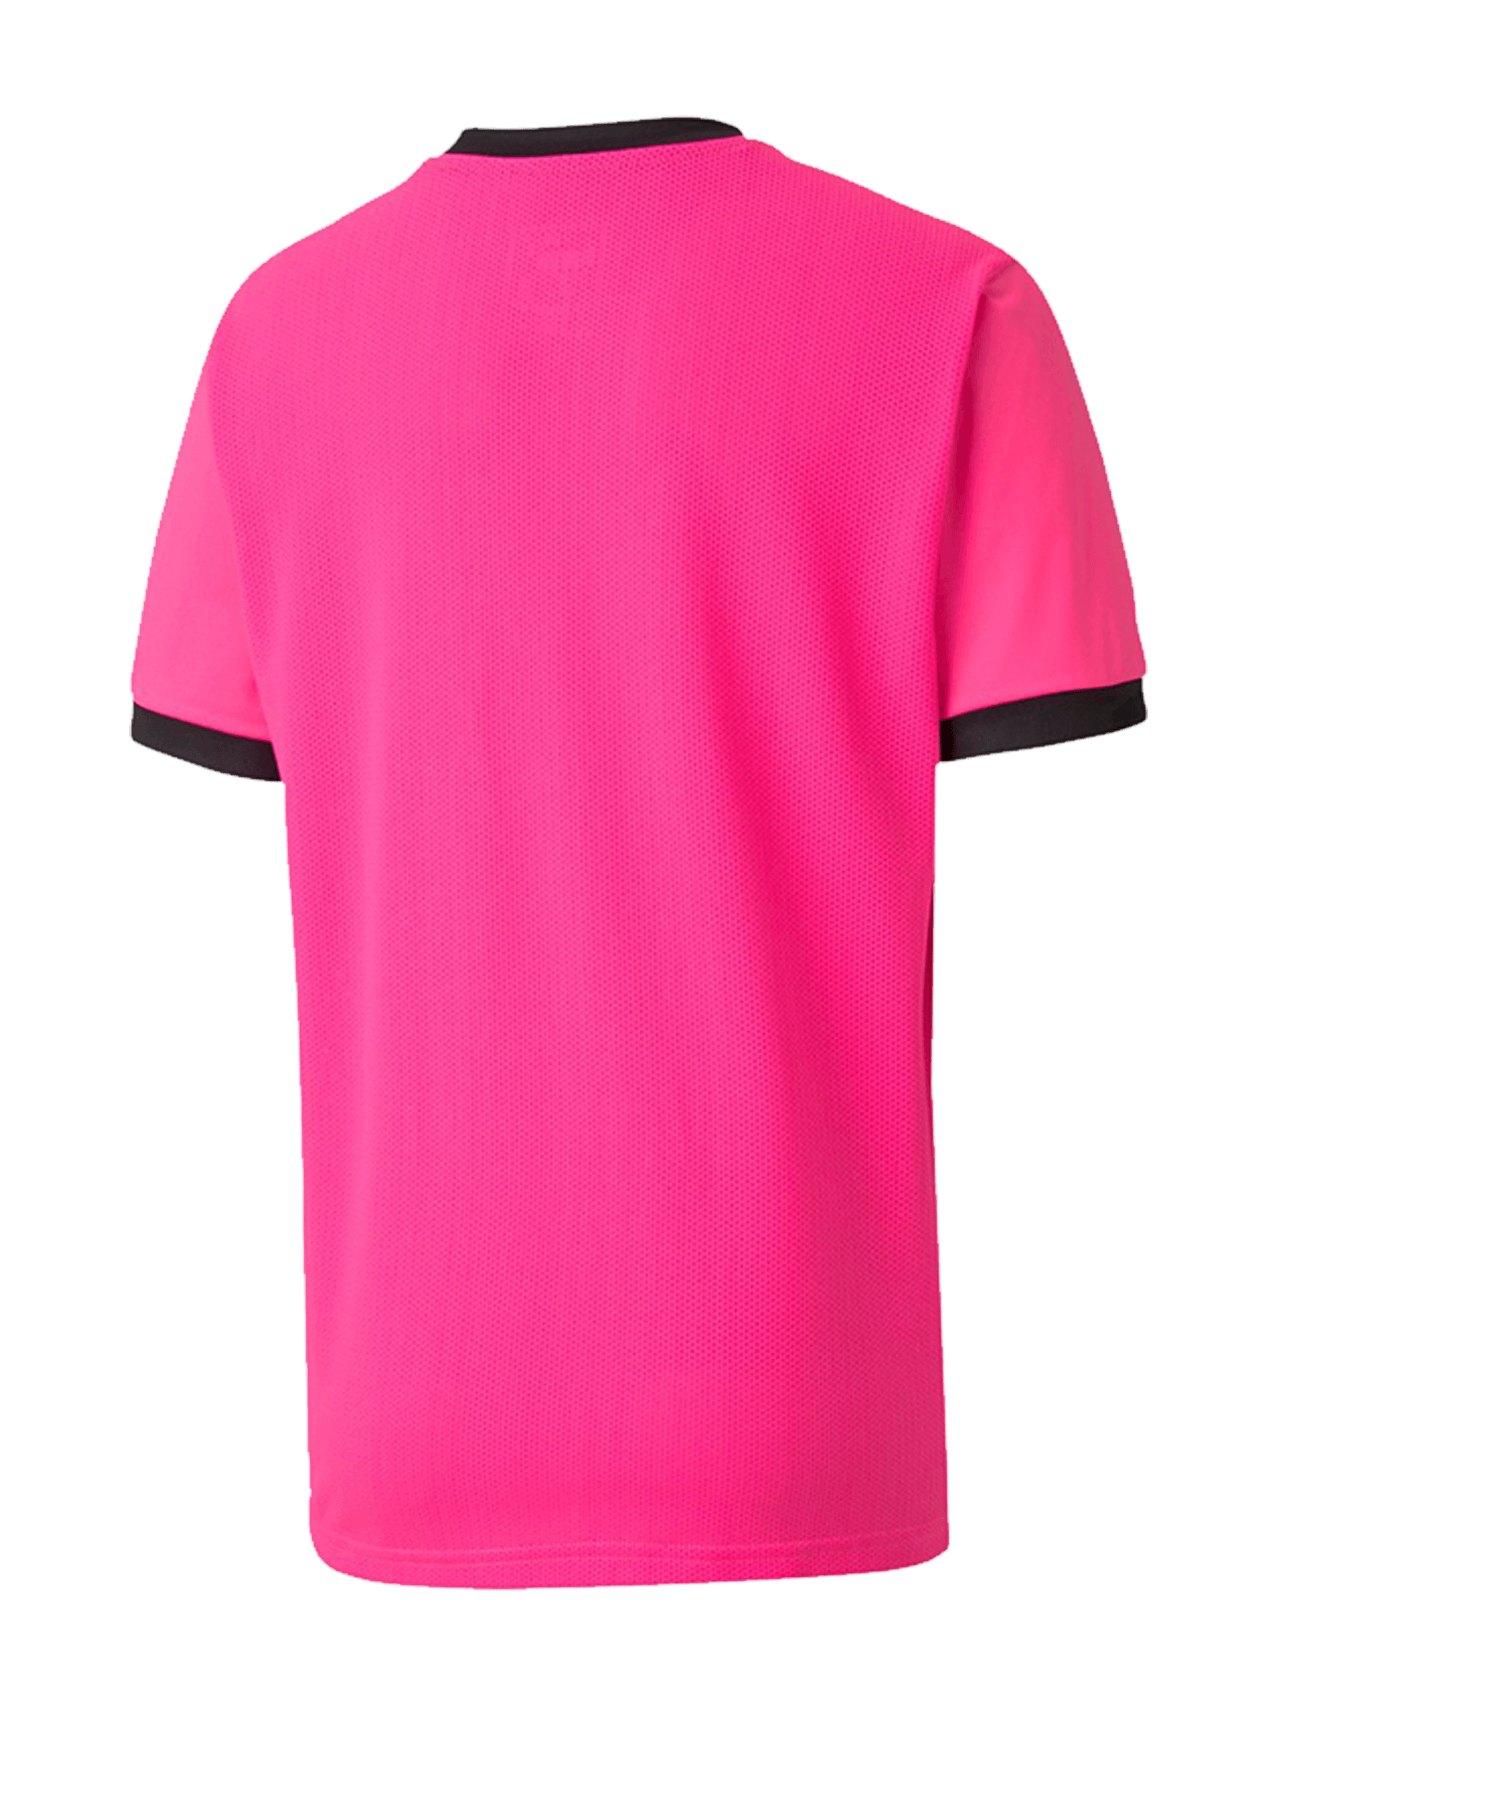 PUMA teamGOAL 23 Trikot kurzarm Kids Pink F25 - pink